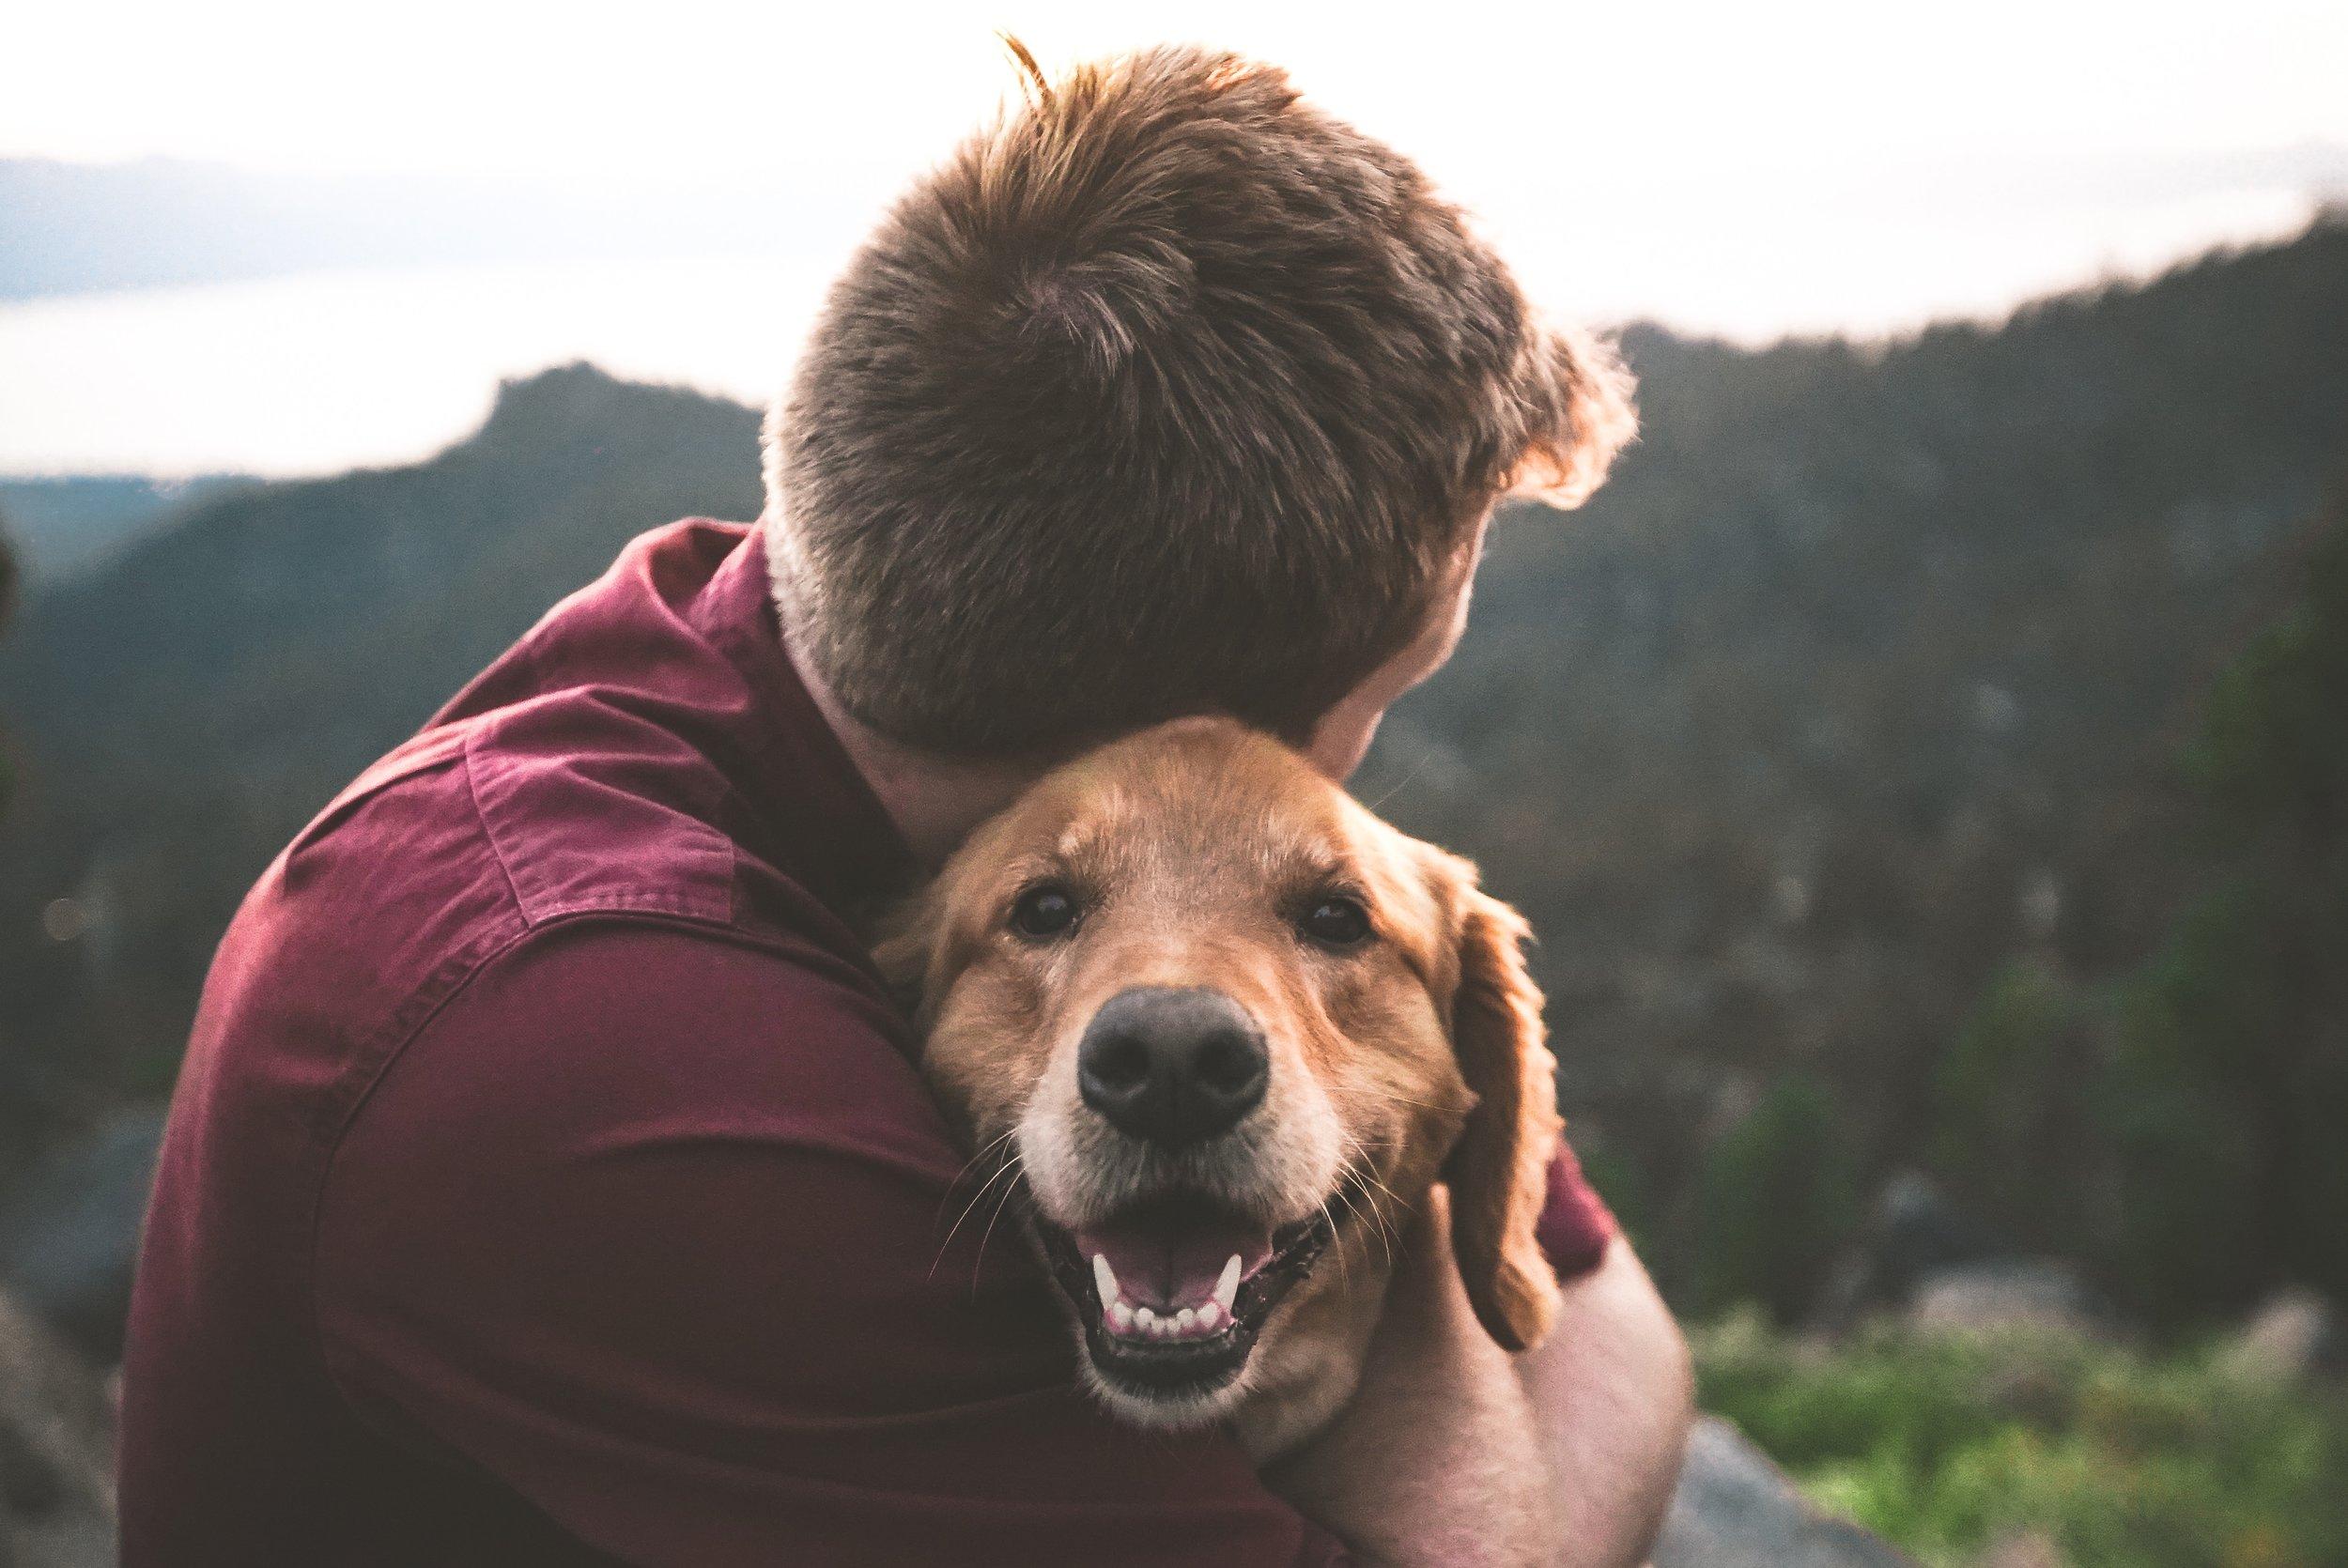 pet care - Dog Pet BoutiqueFox Companion CareGroom | Dog Care with LoveHeath SpotJust Food for DogsLaurel Pet HospitalPosh Pet CareRover.comTailwaggers PetsUnleashed by PetcoVCA TLC Animal HospitalWilliam S Dog Park